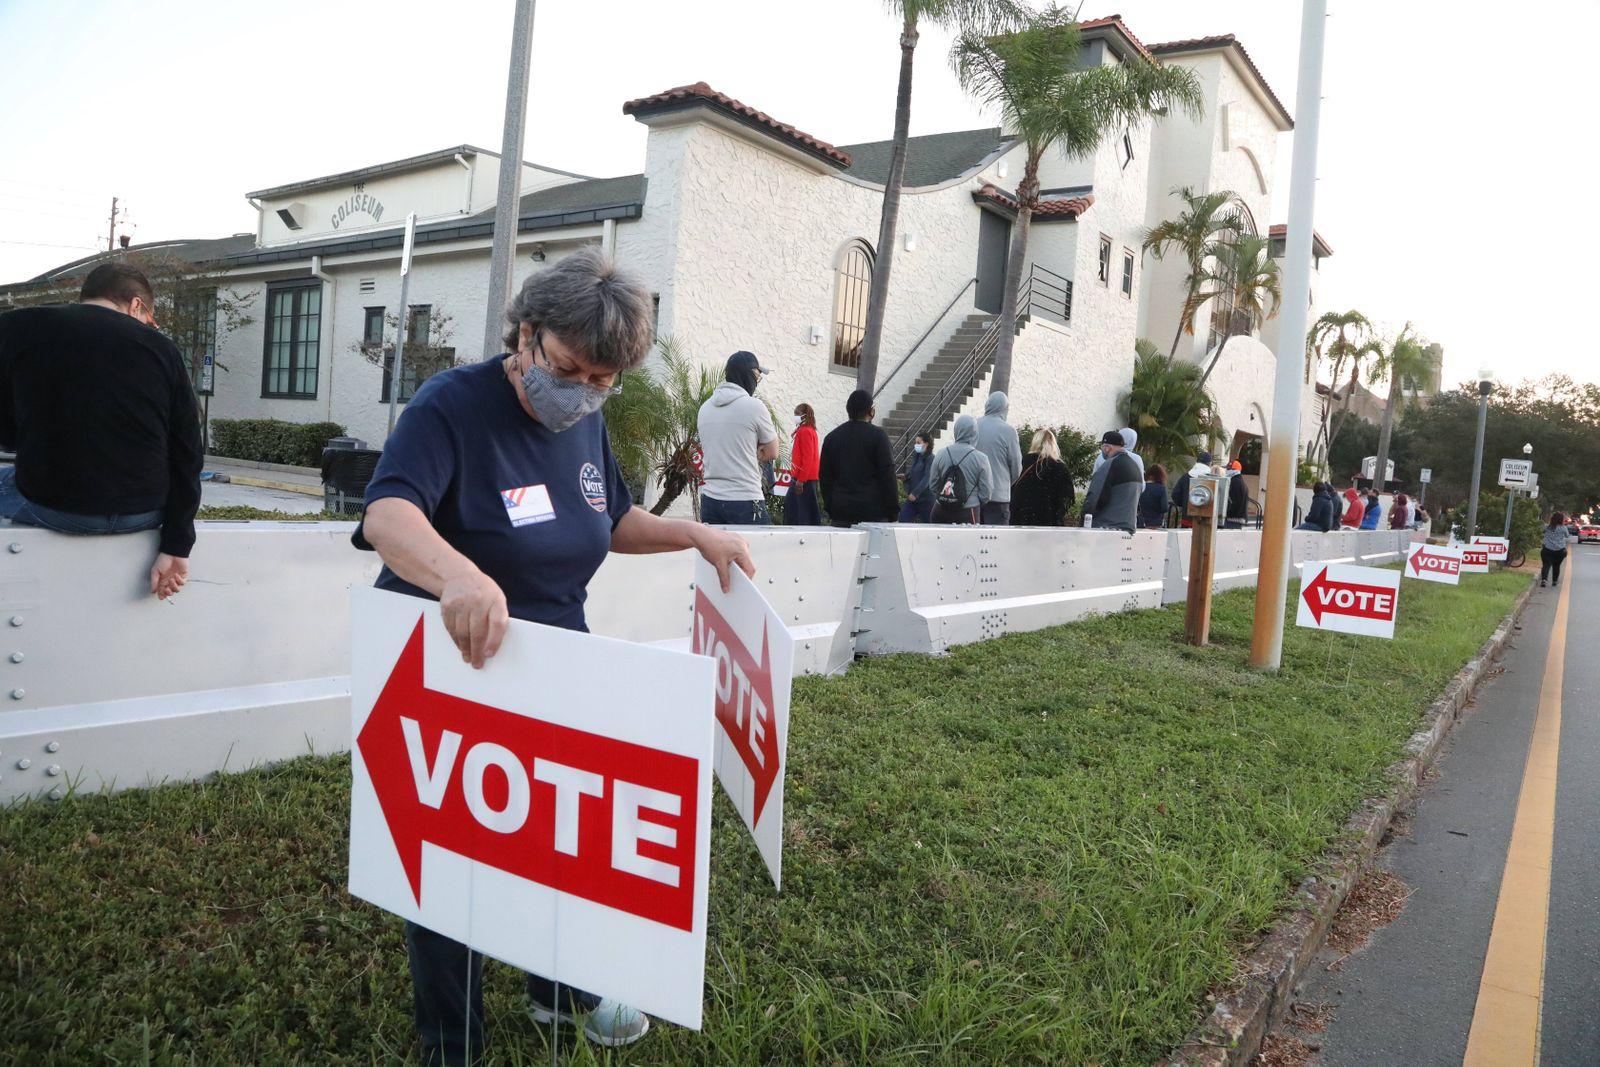 November 3, 2020, St. Petersburg, Florida, USA: Pinellas County Supervisor of Elections volunteer Jane Sherman, St. Pet